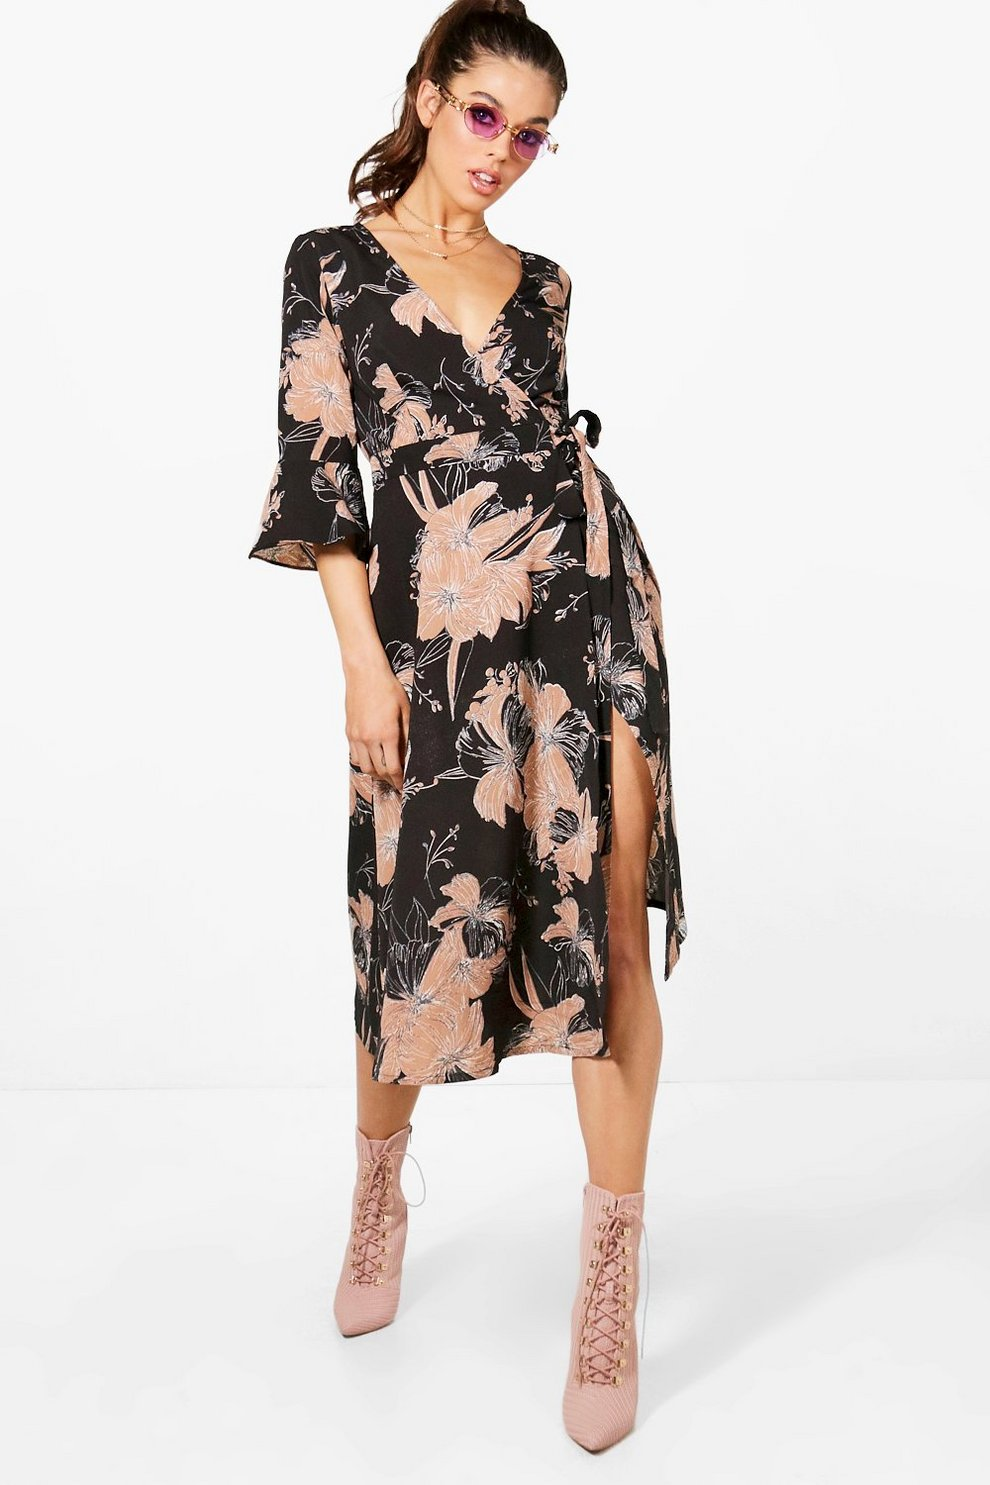 7461554fcf9e5 Boohoo High Neck Floral Midi Dress - raveitsafe